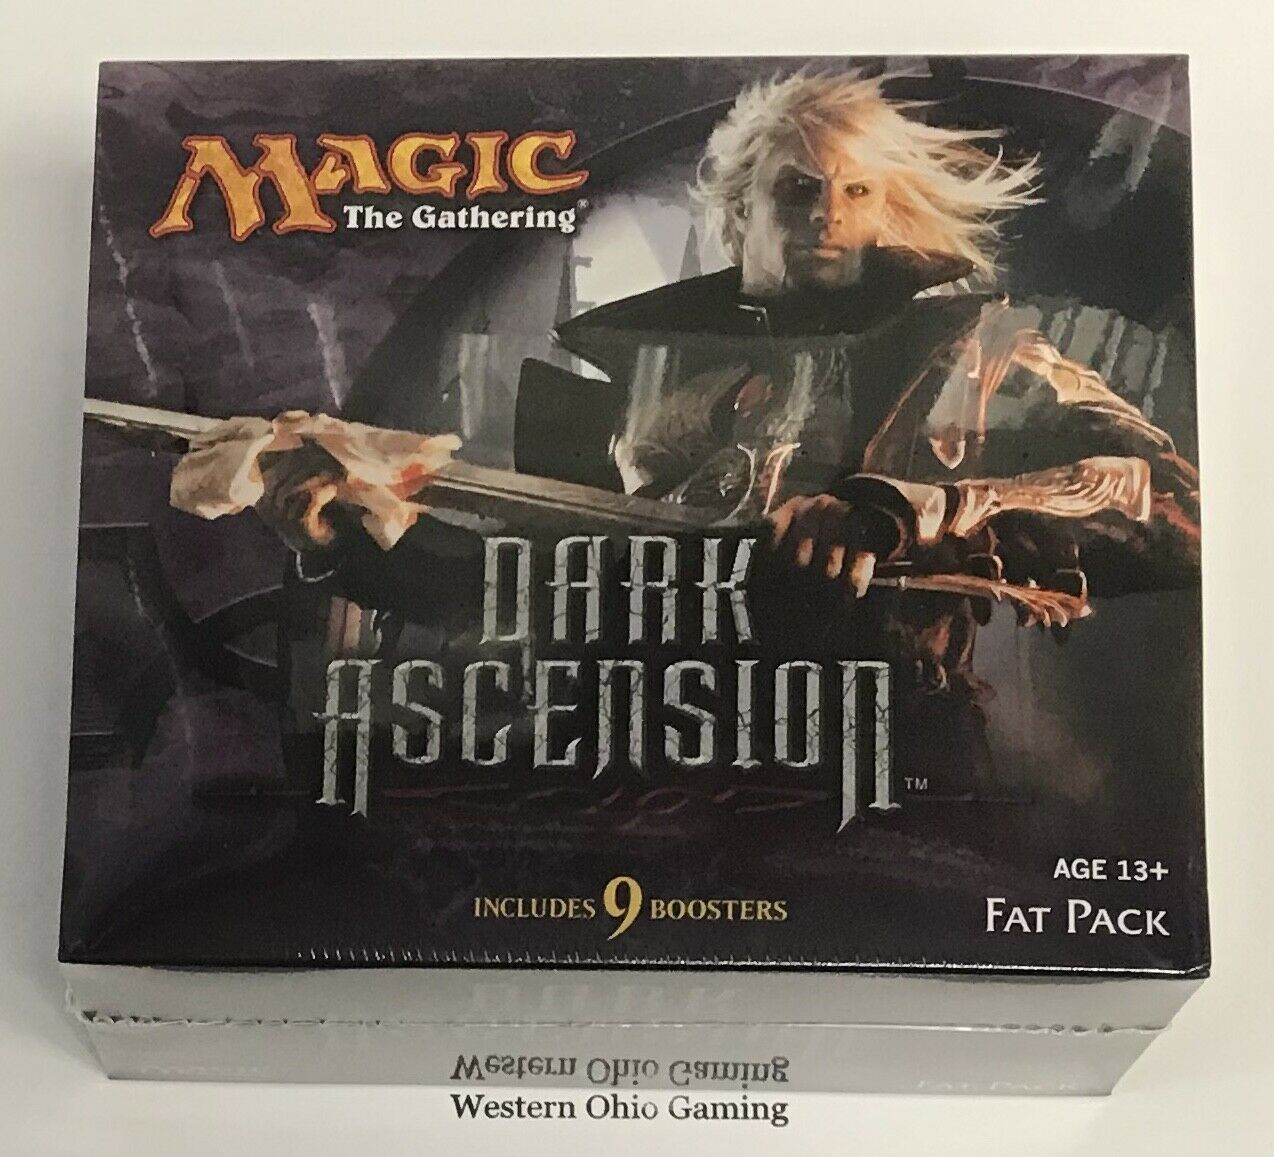 Magic MTG Dark Ascension Fat Pack Sealed English